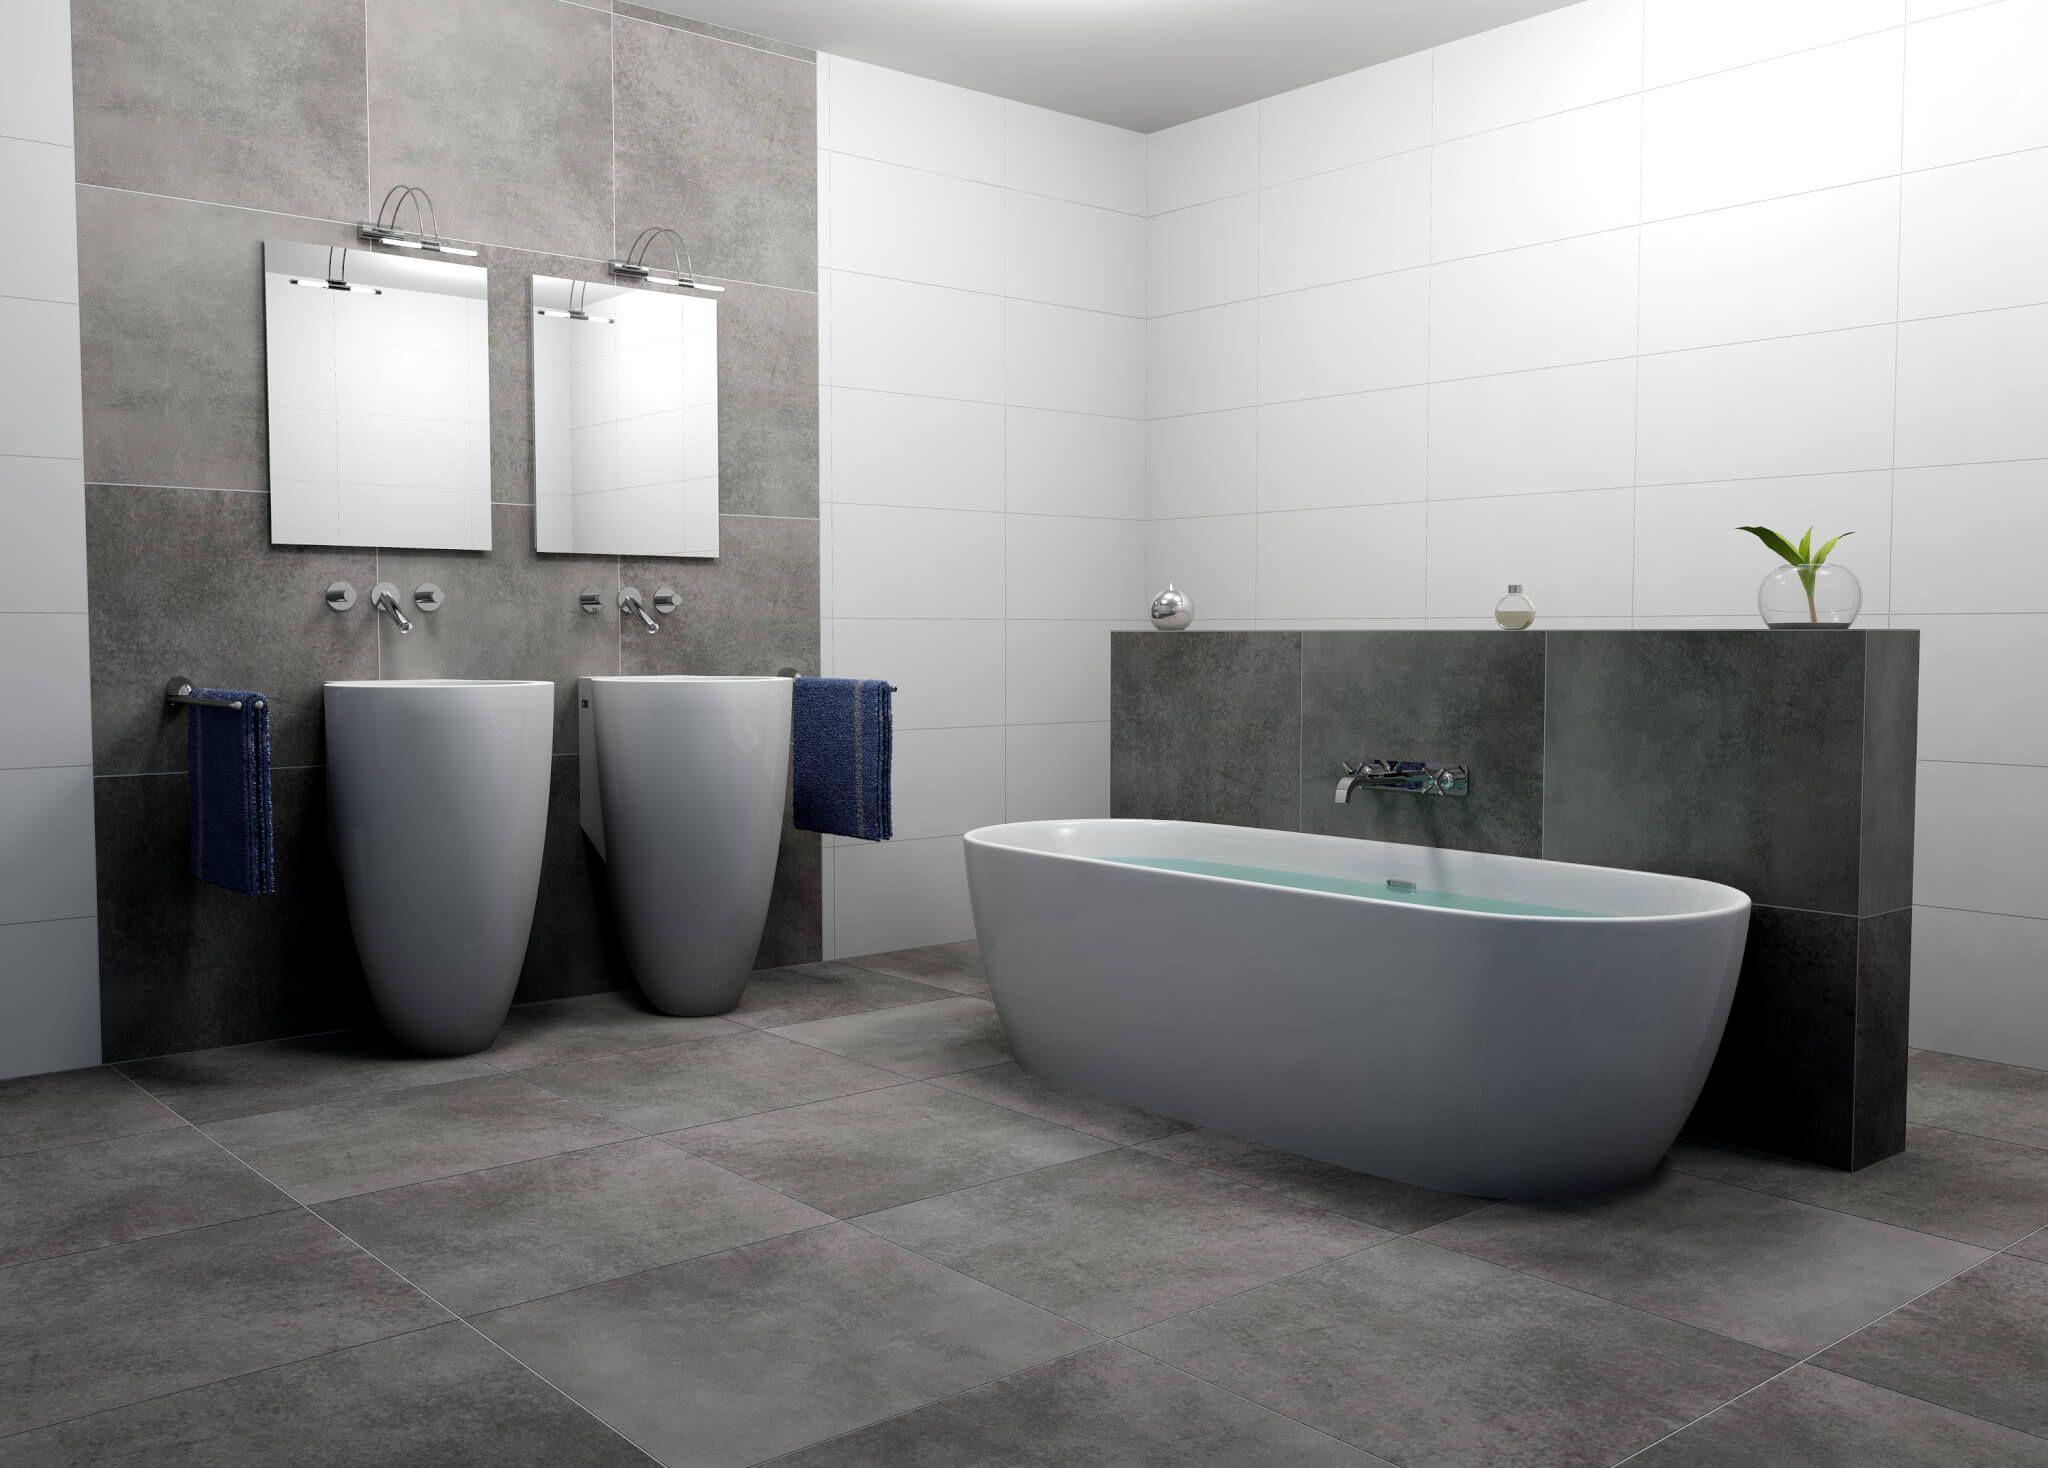 Mooie Moderne Badkamers : Spanplafond inspirerende badkamers om van weg te dromen